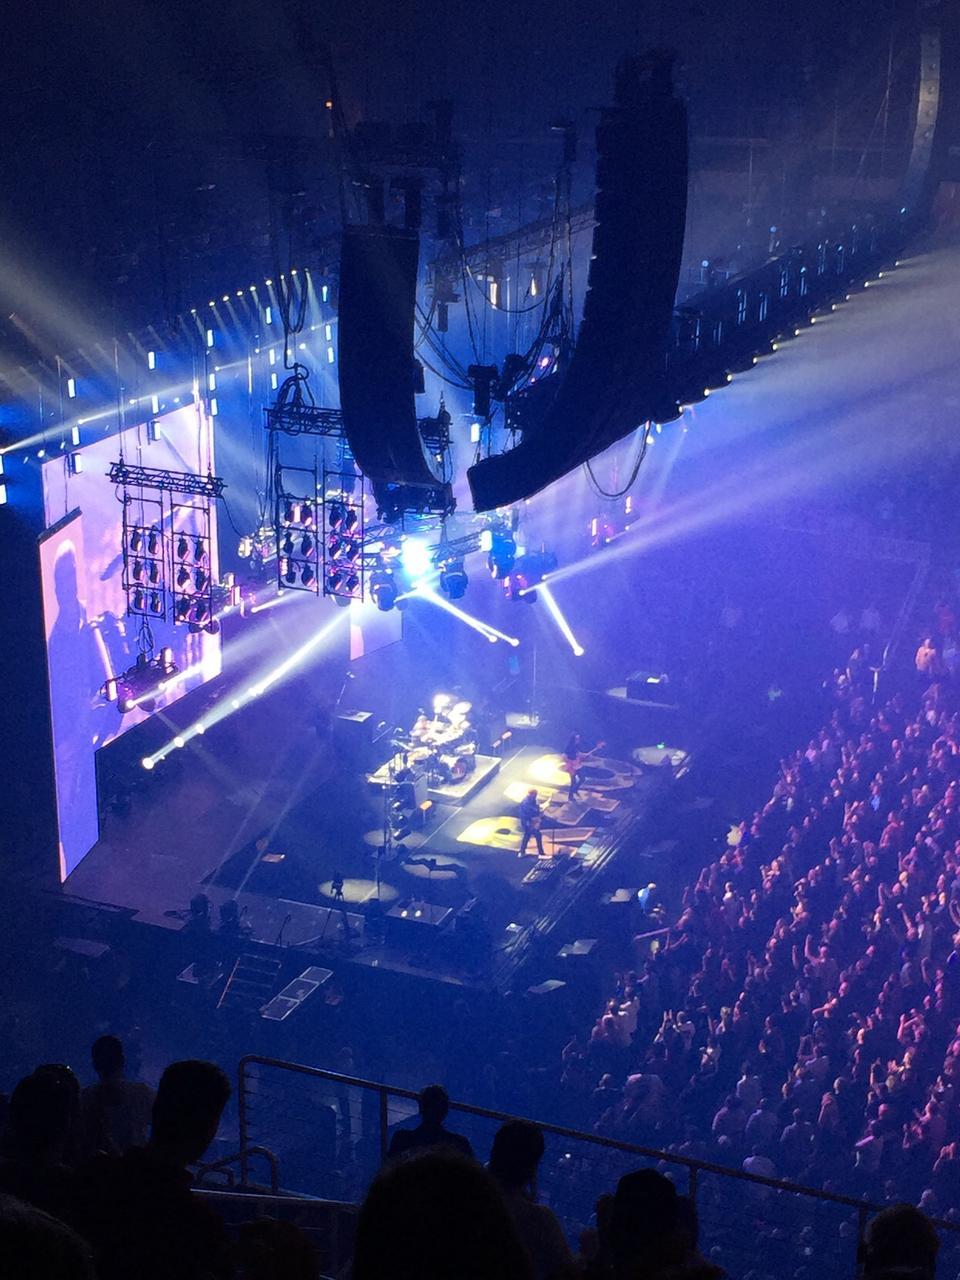 SAP Center Section 216 Concert Seating  RateYourSeatscom